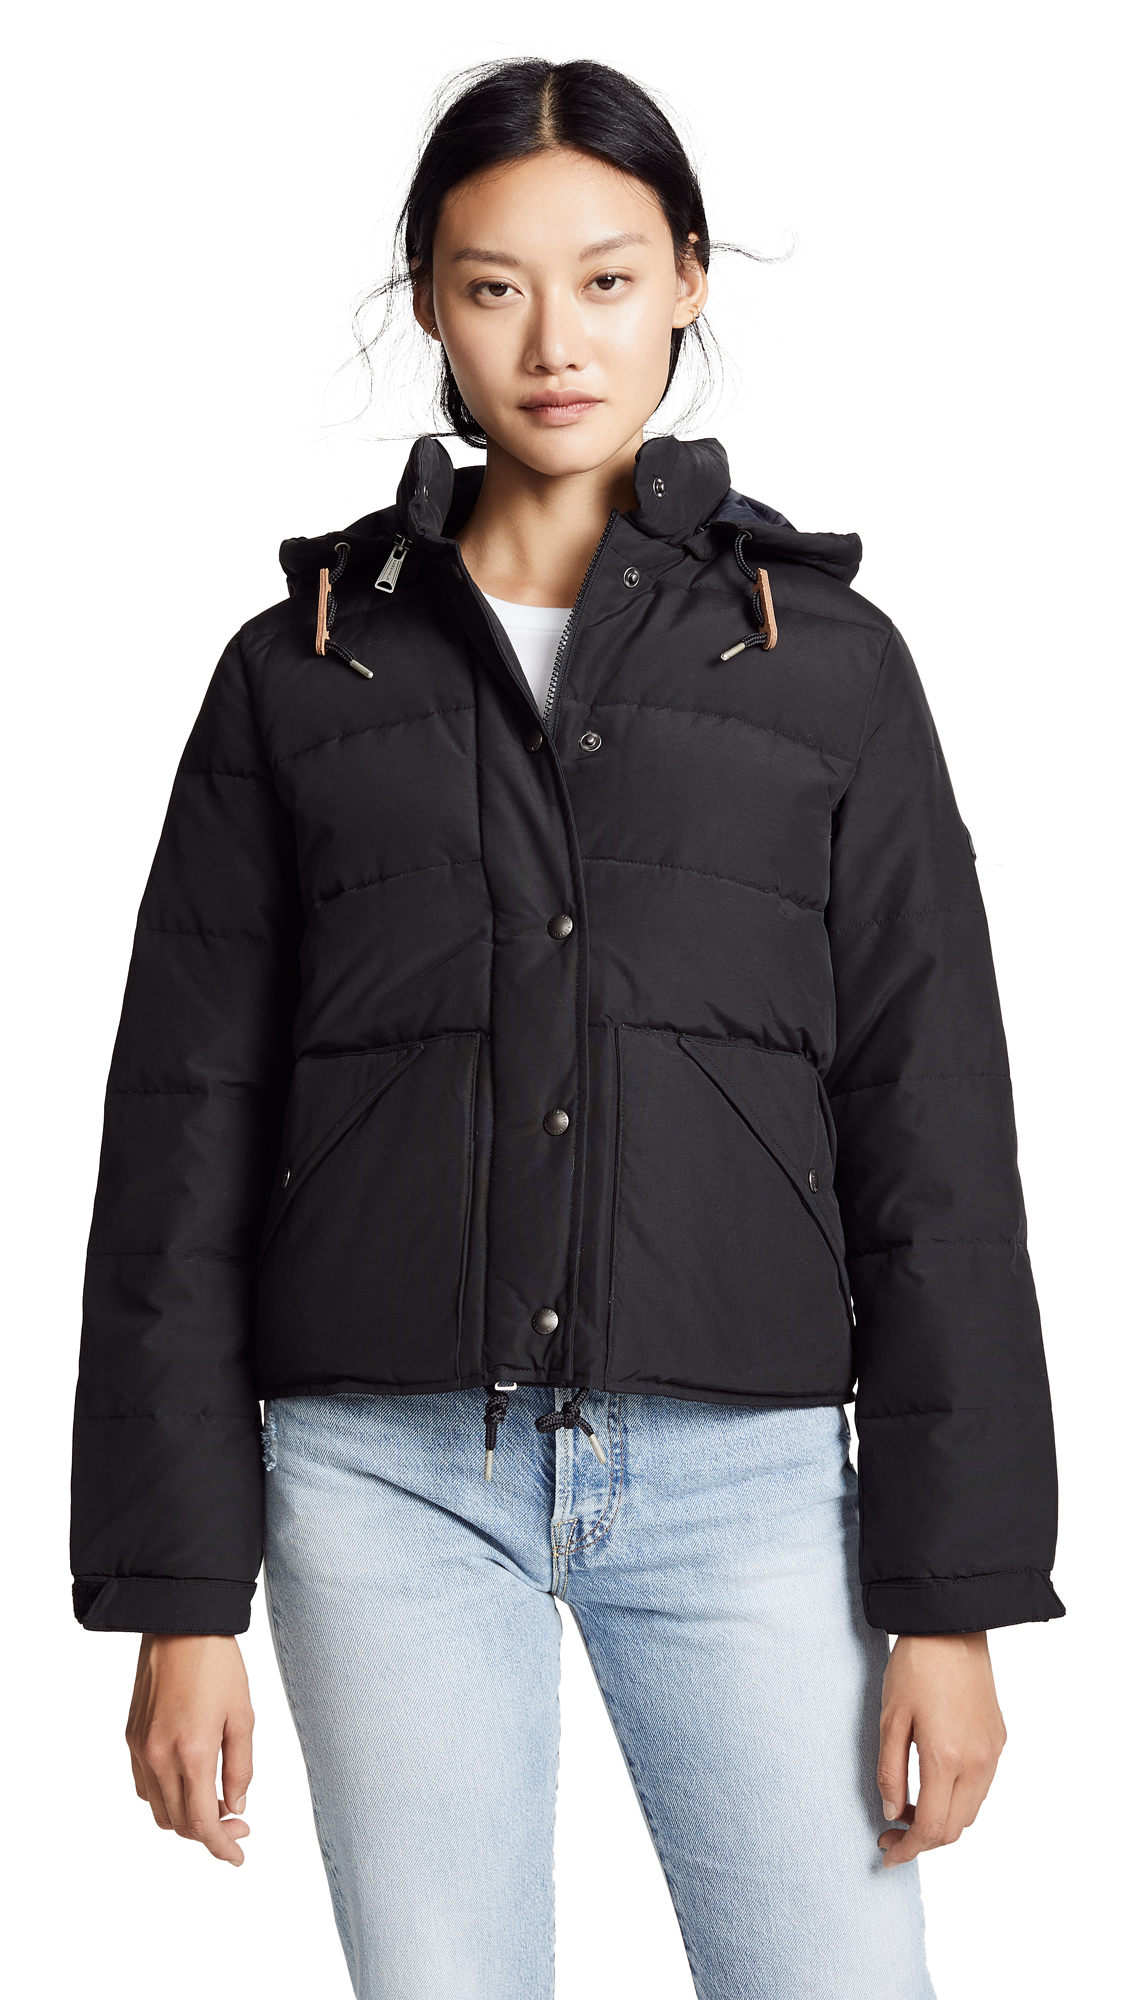 PENFIELD Bowerbridge Coat in Black